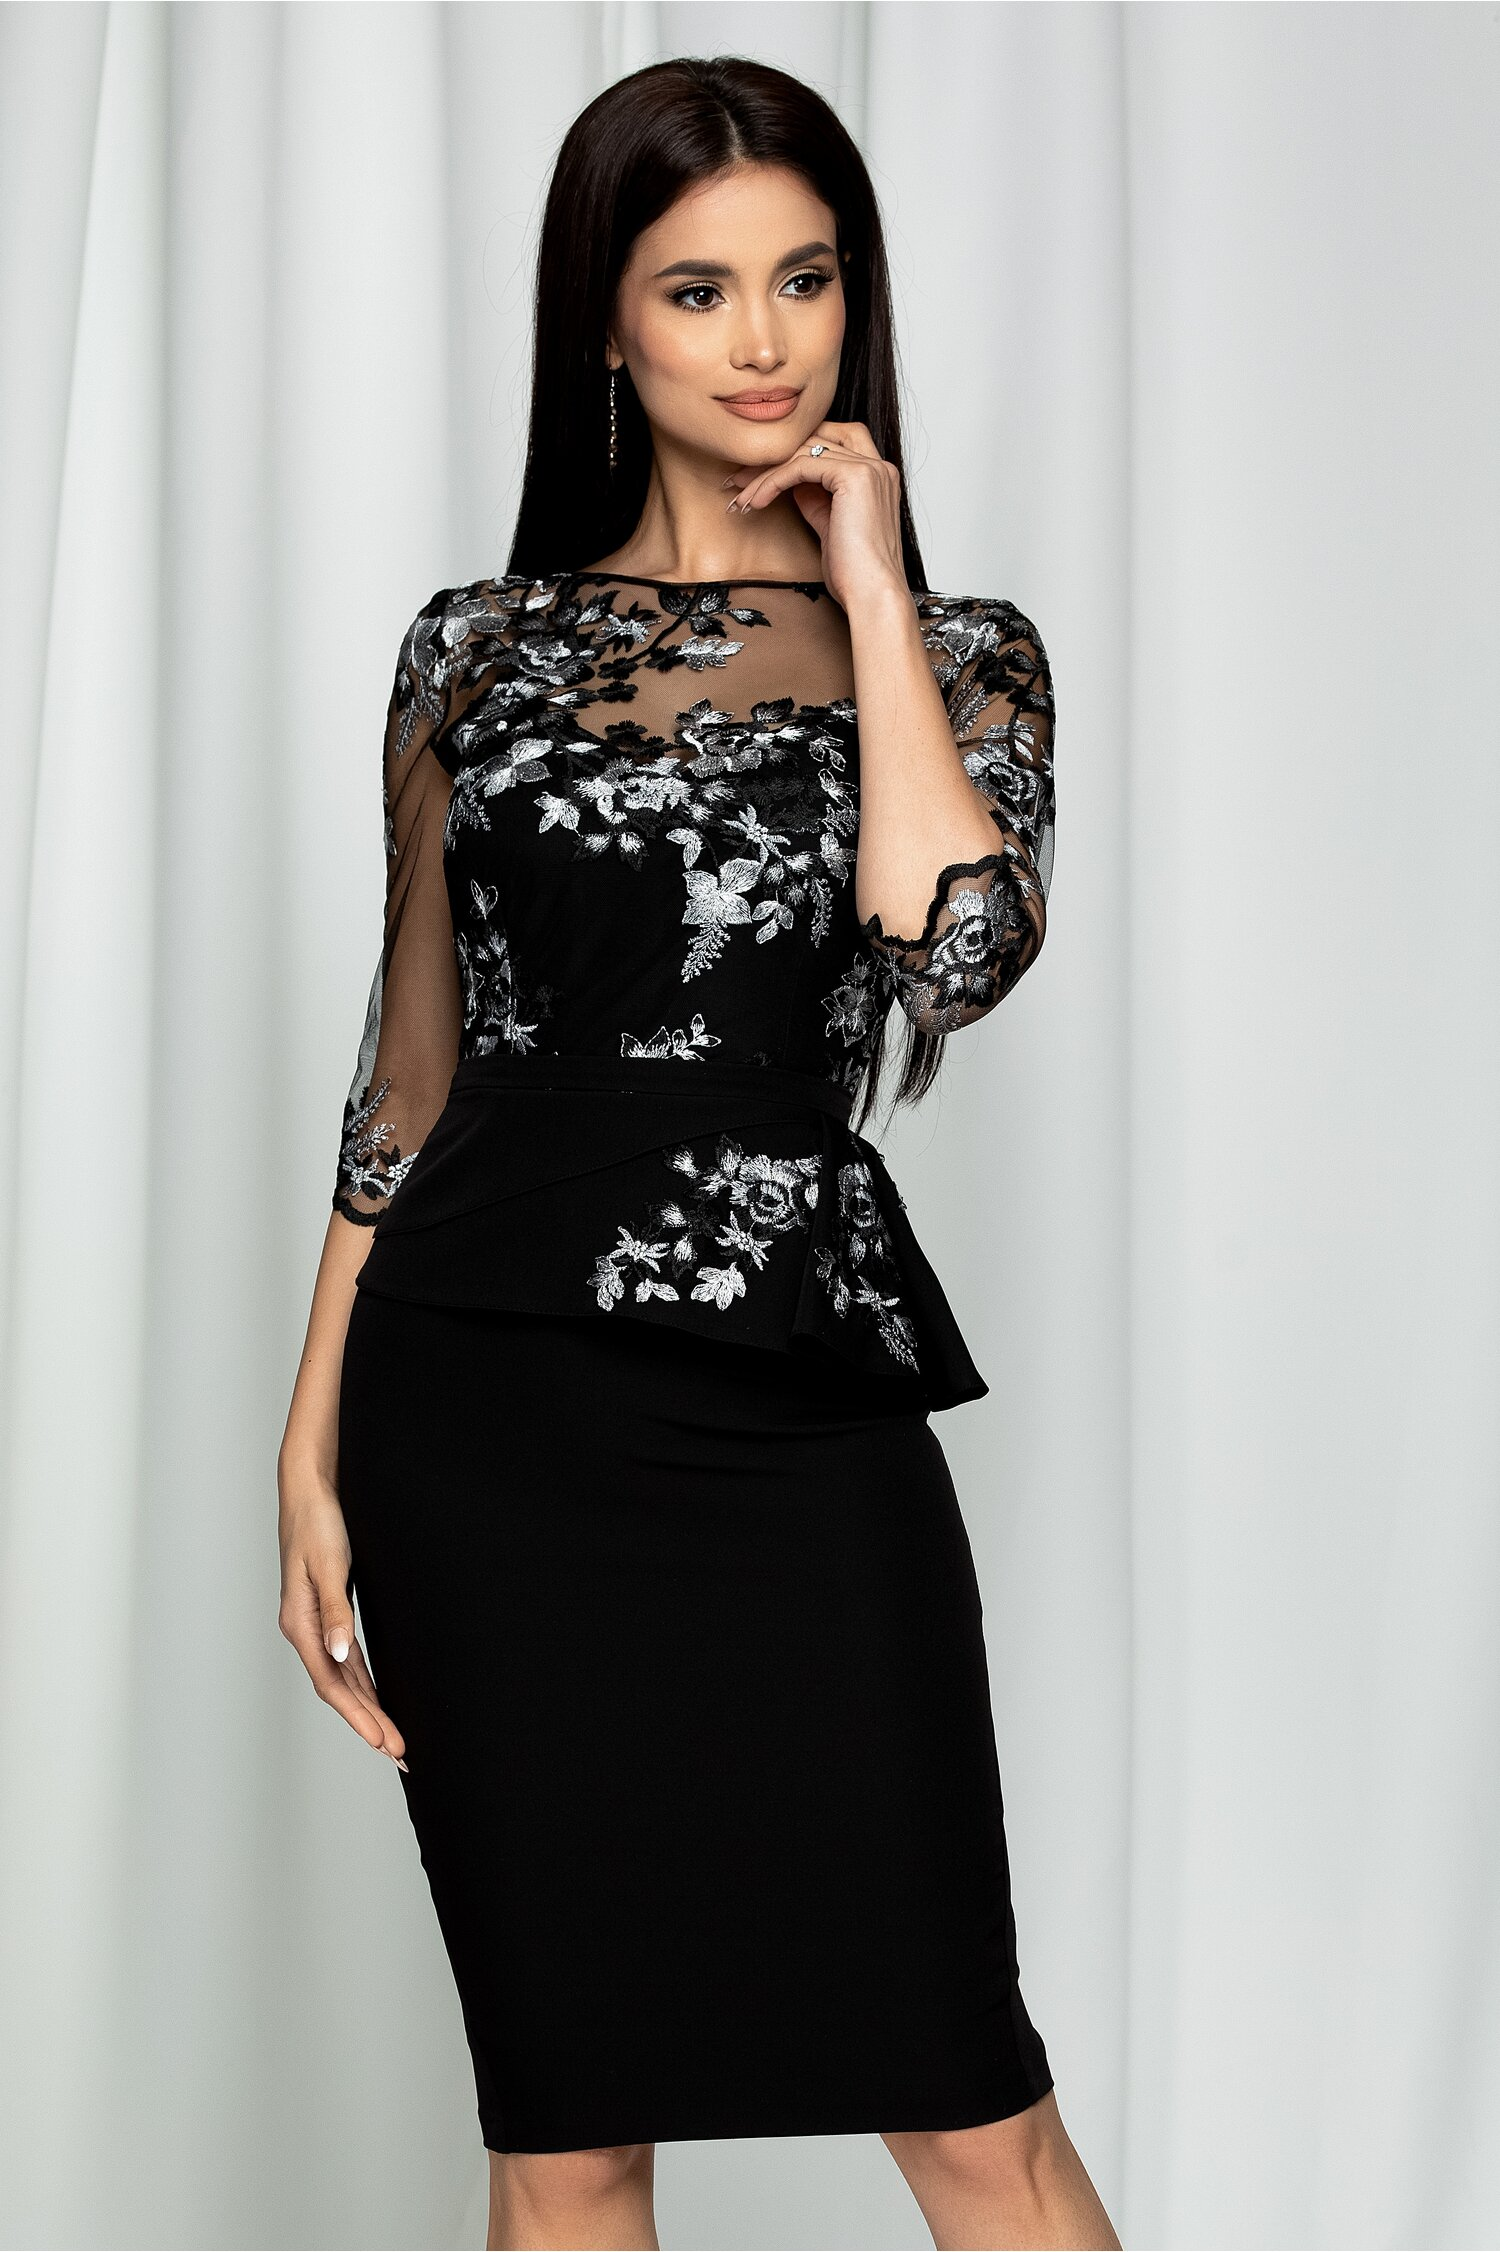 Rochie MBG neagra cu broderie florala gri la bust si peplum elegant